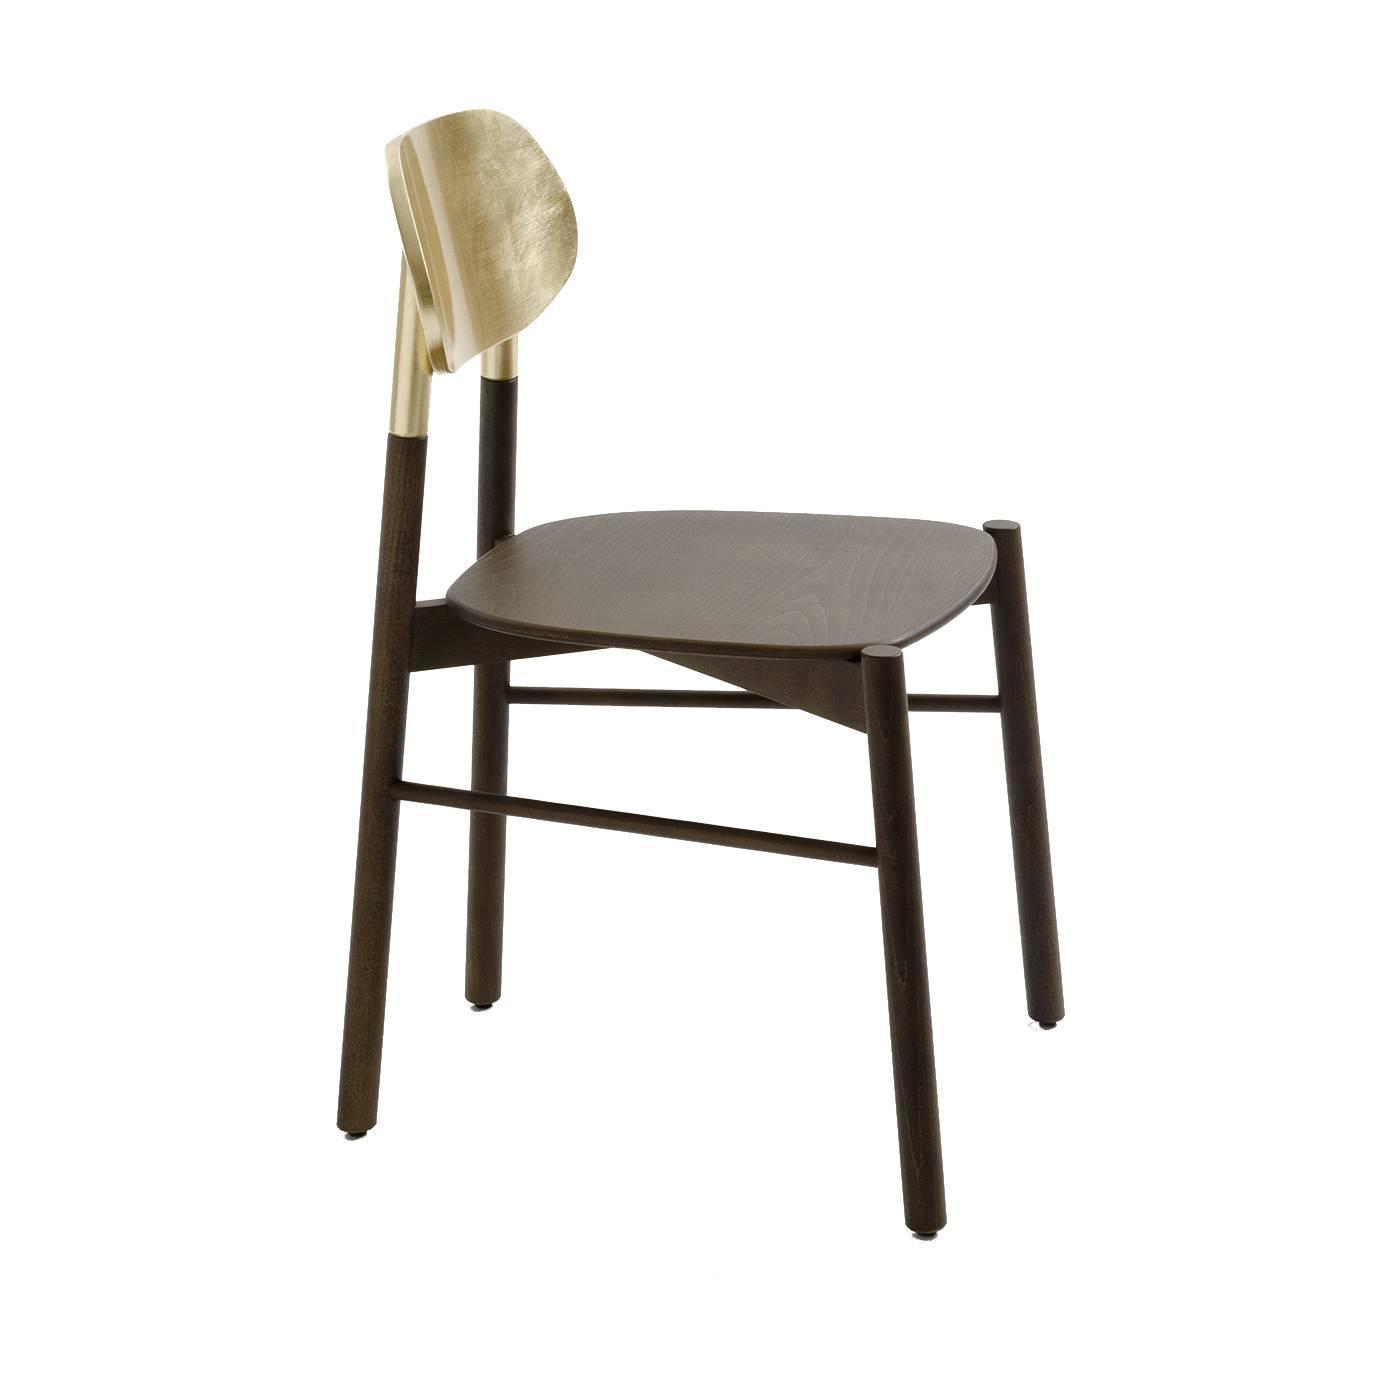 Striking Gold 'Bokken' Chair For Sale at 1stdibs -